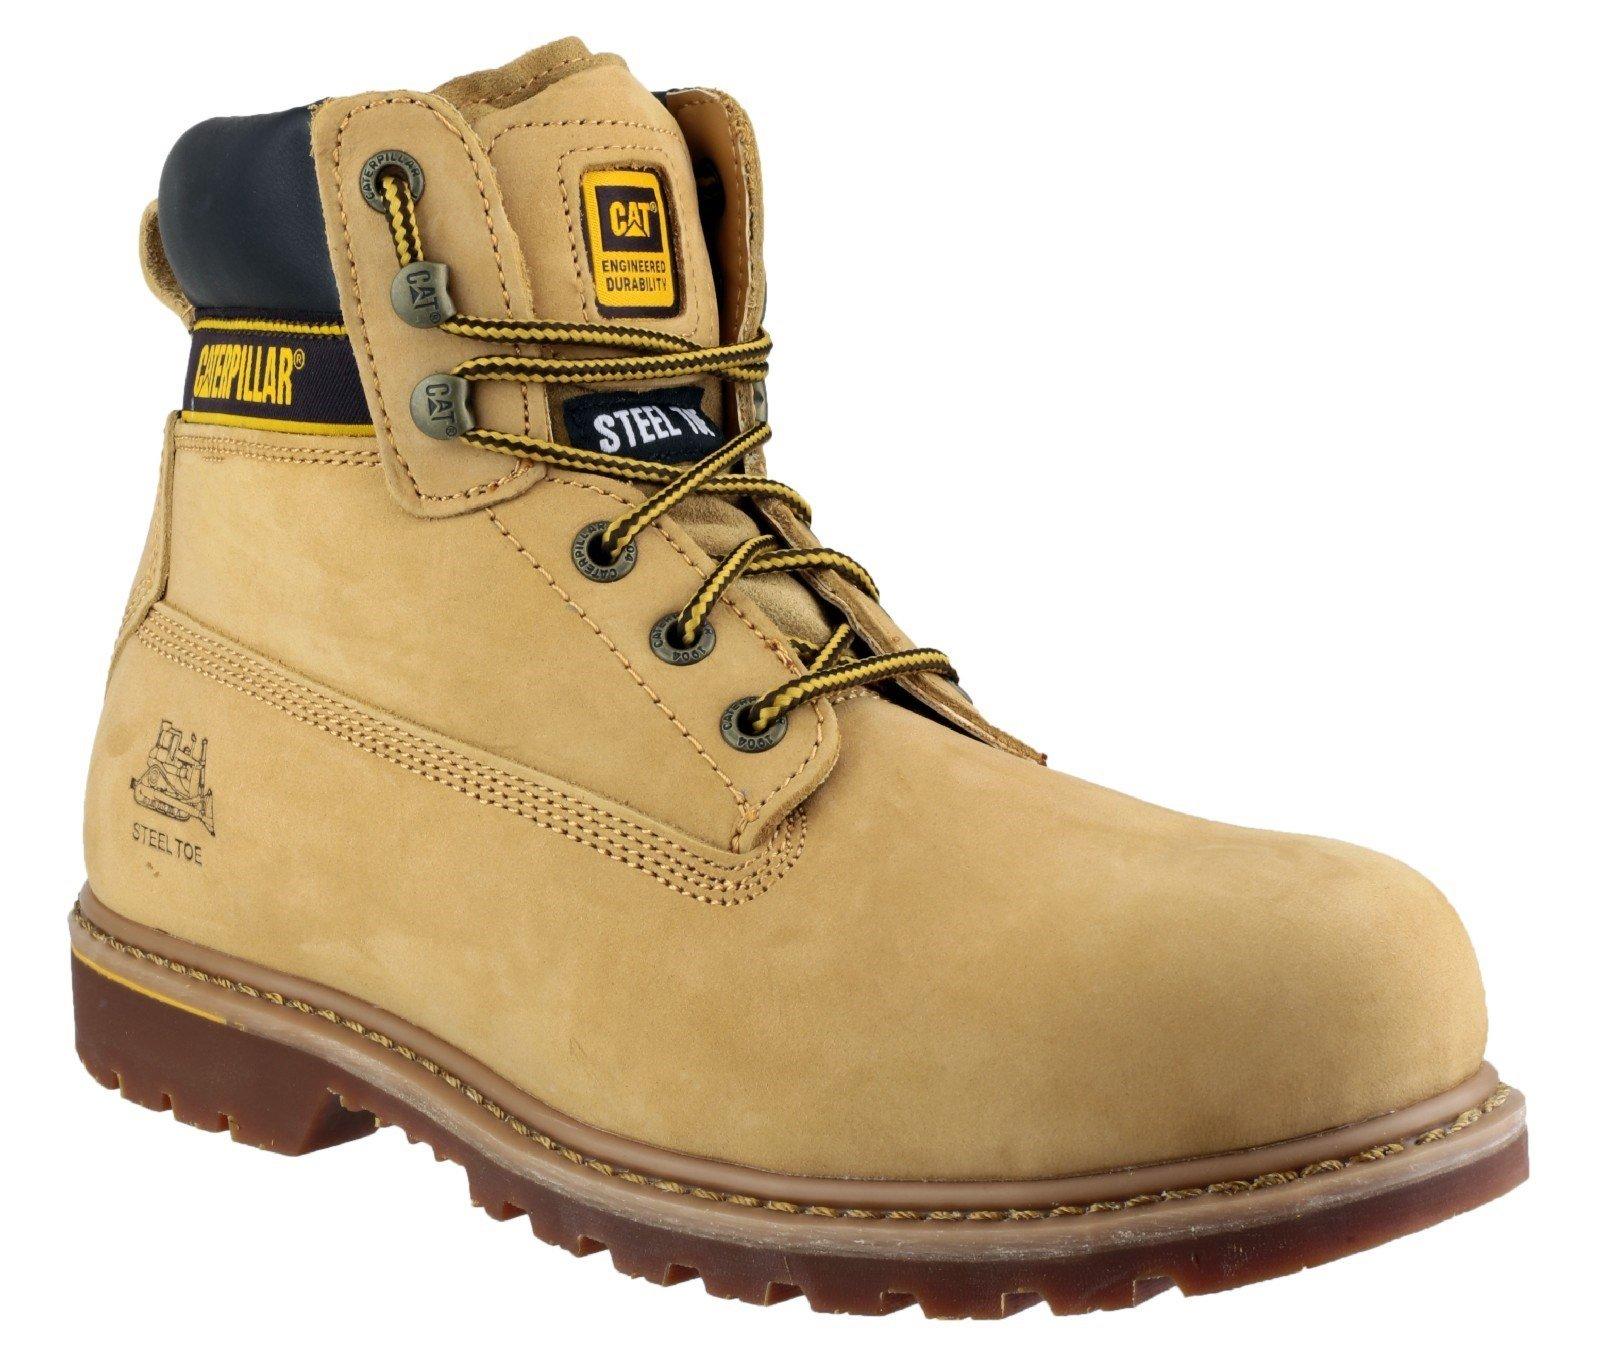 Caterpillar Men's Holton S3 Safety Boot Honey 16107 - Honey 6